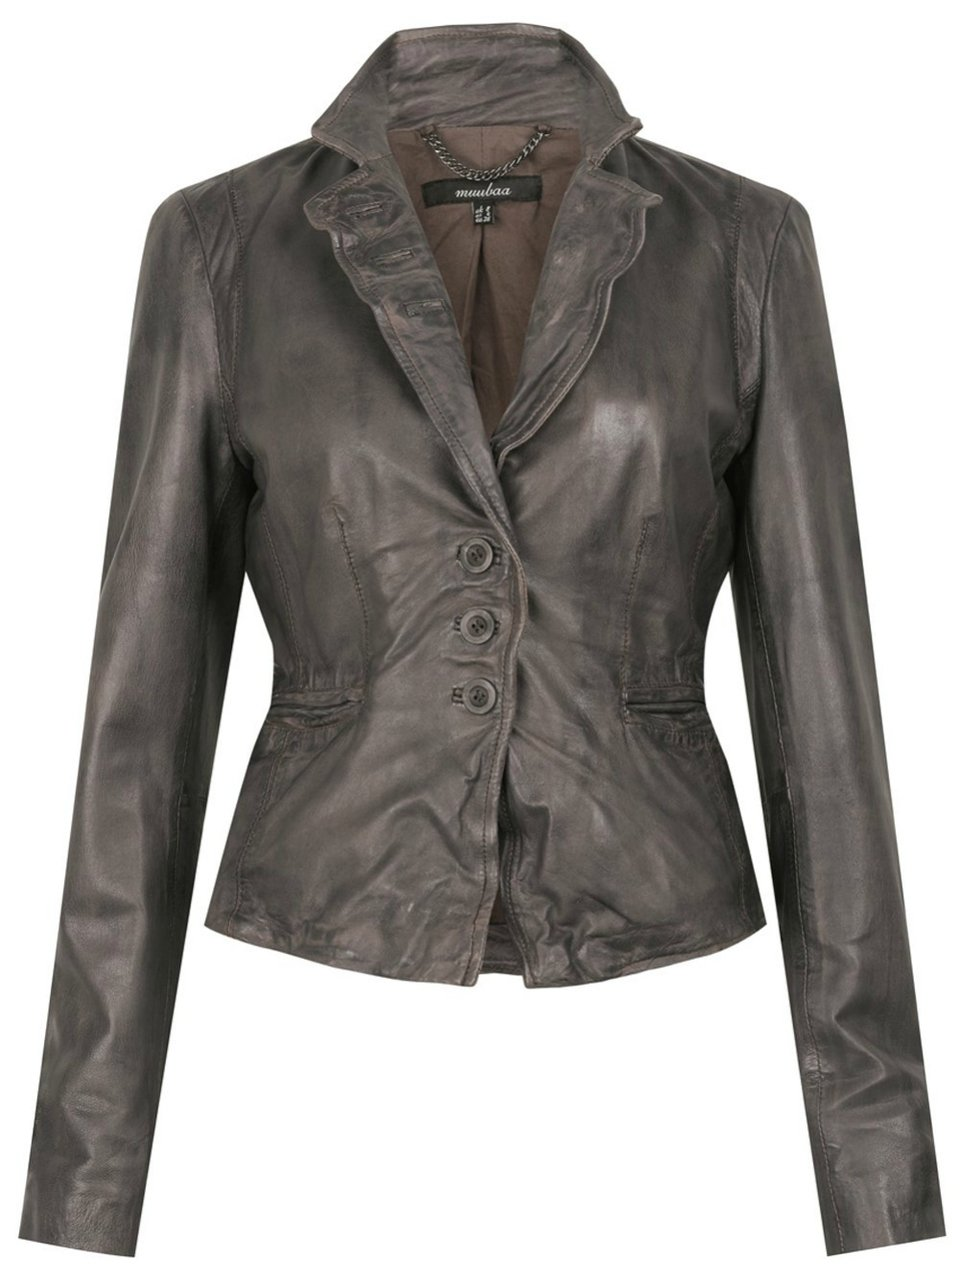 Muubaa Naiden Leather Blazer In Mud Grey (6)